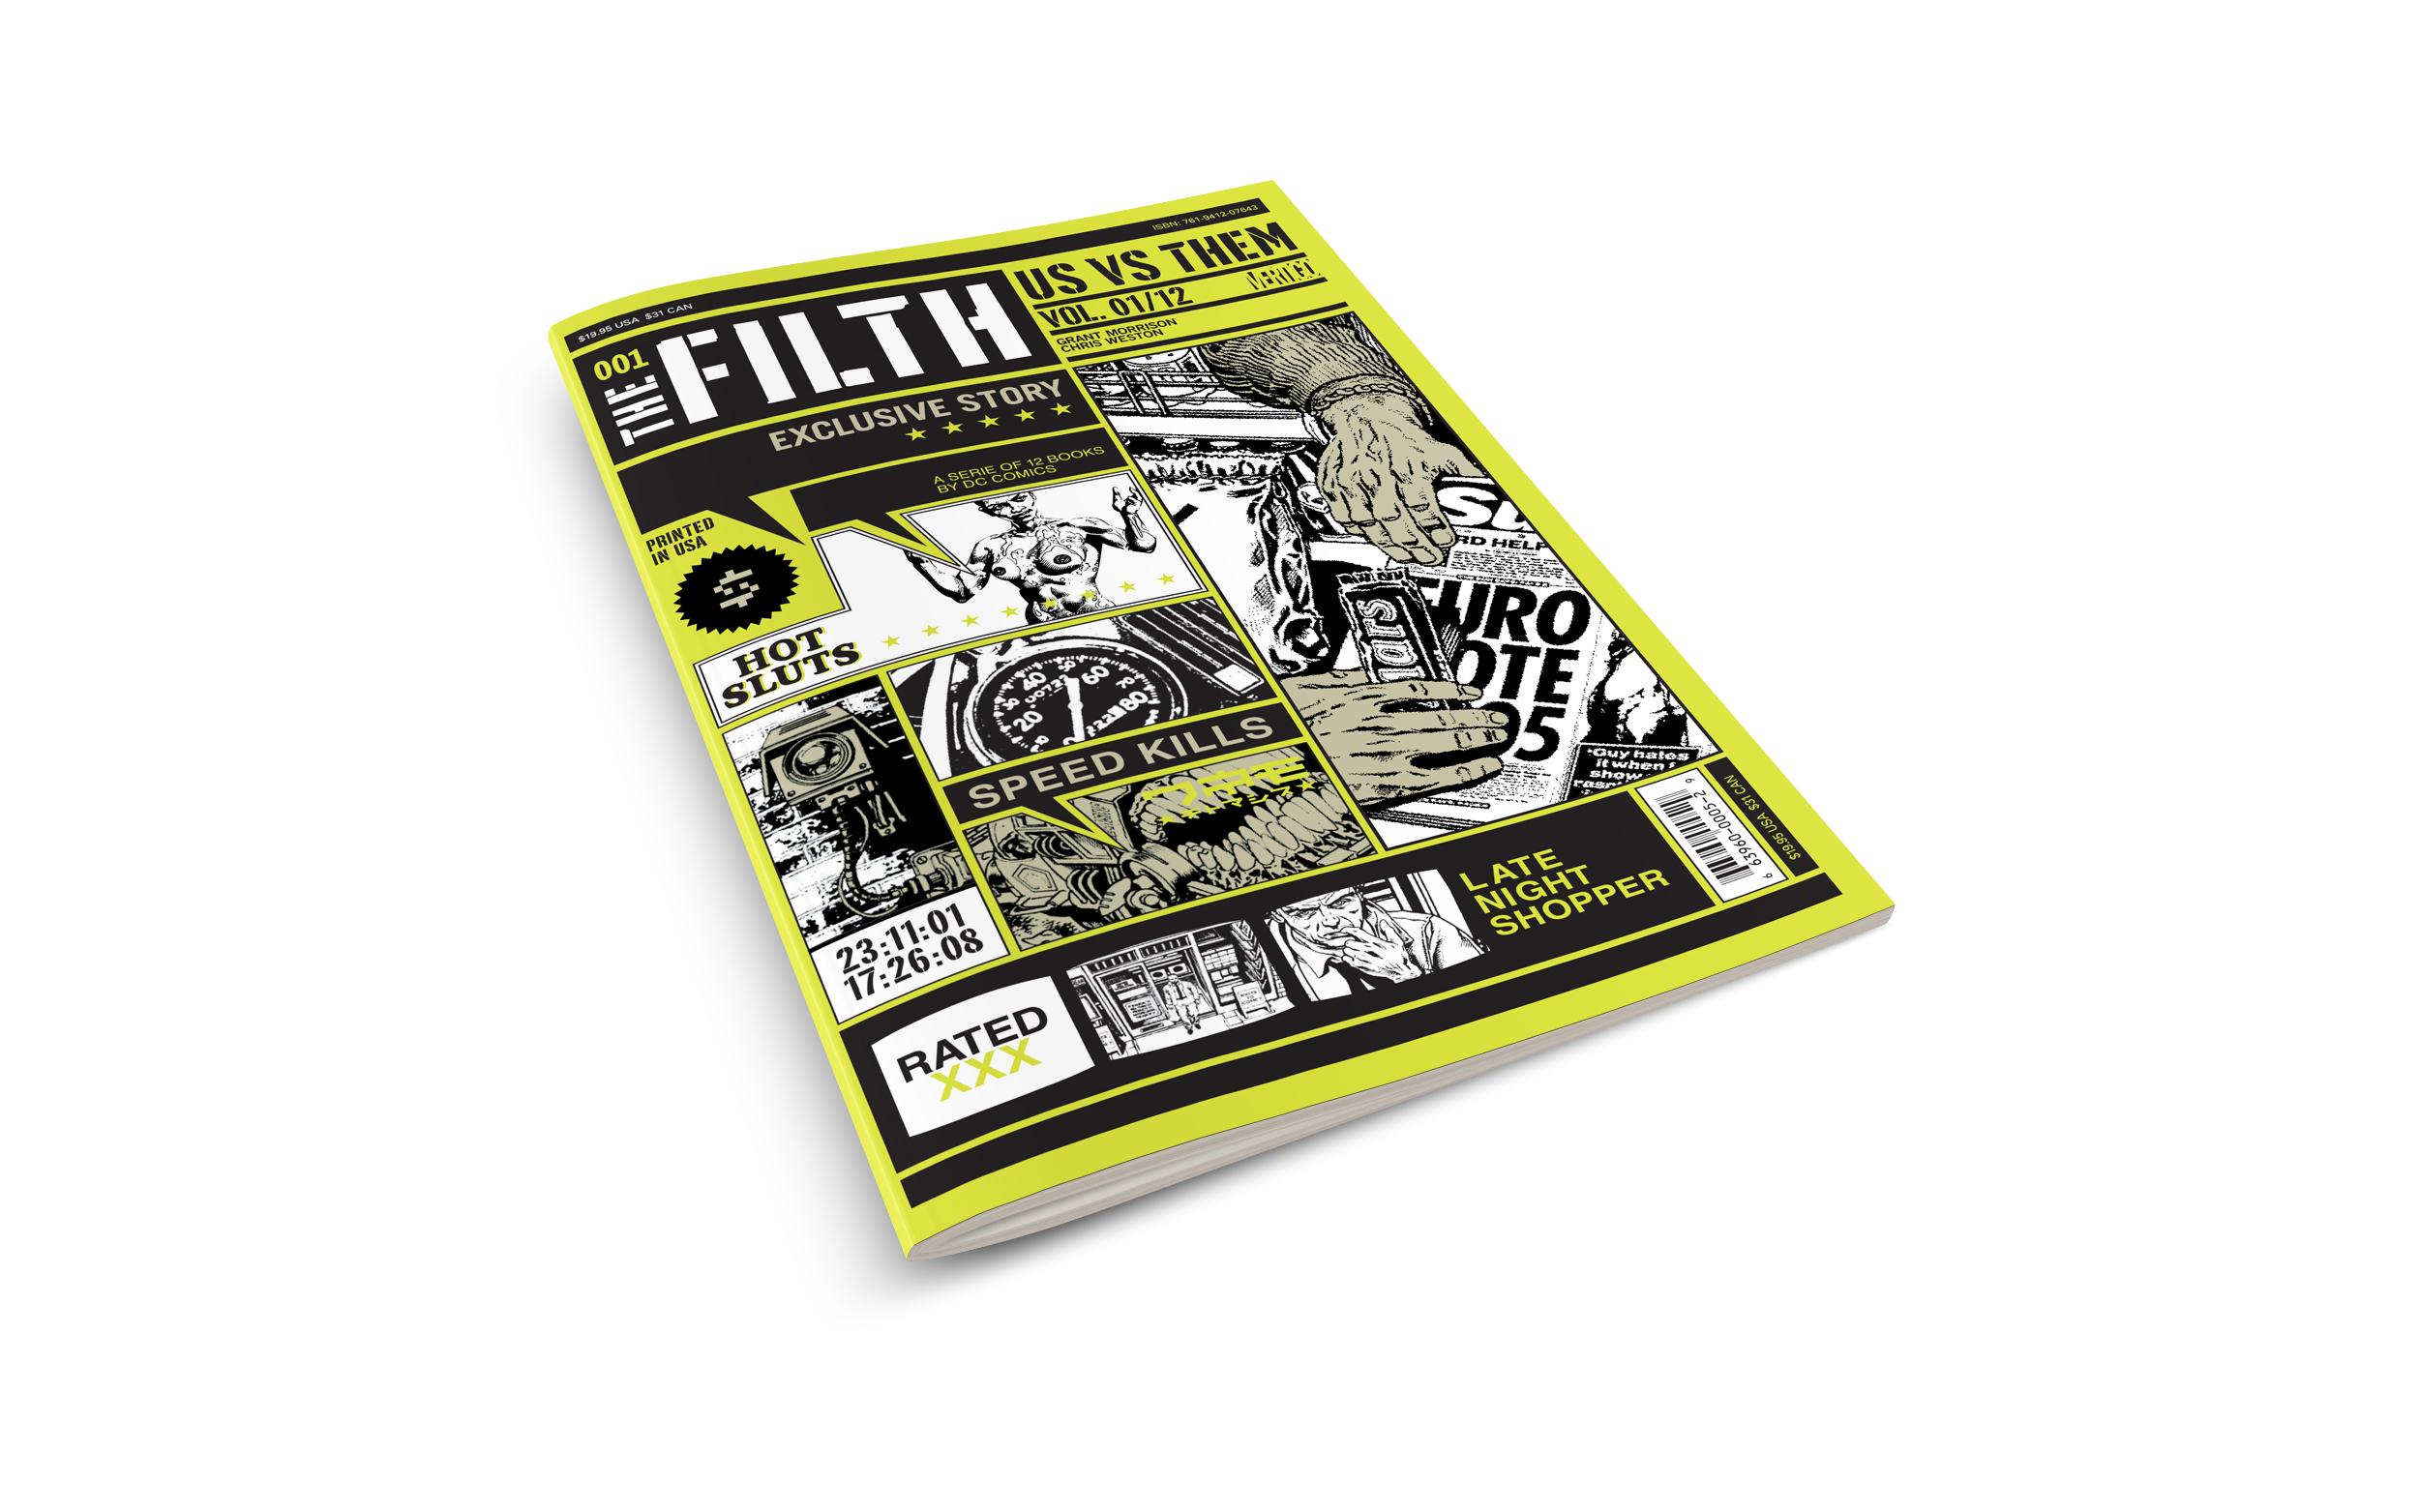 filth_us-vs-them_9_comp_2500w.jpg